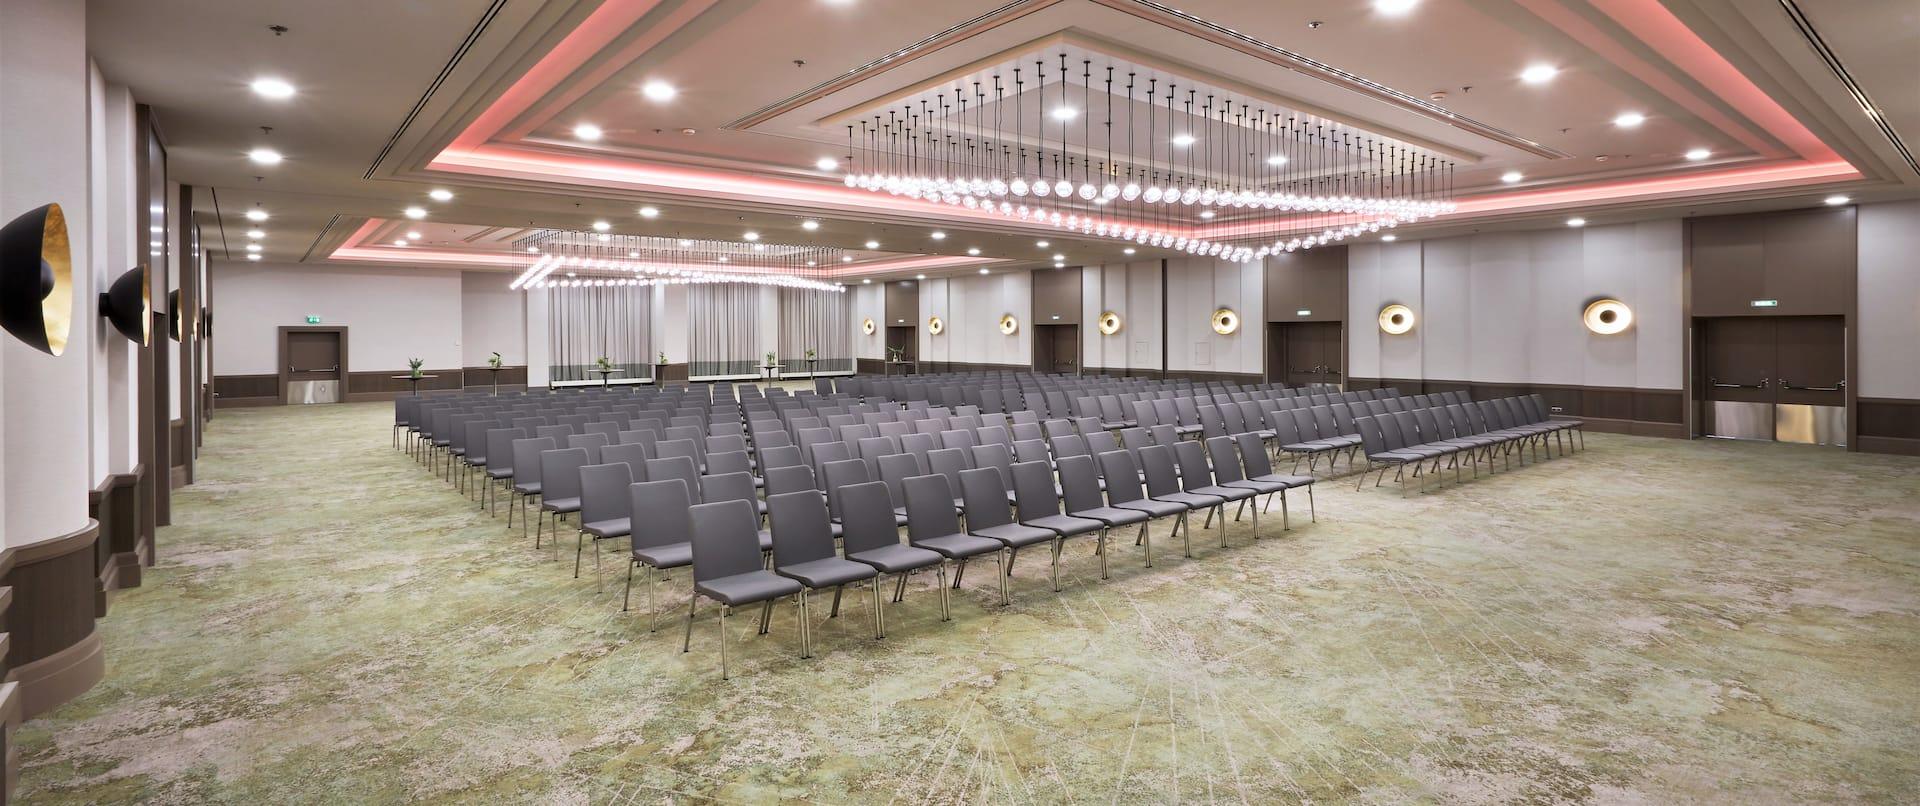 Frankfurt Ballroom with rows of seating